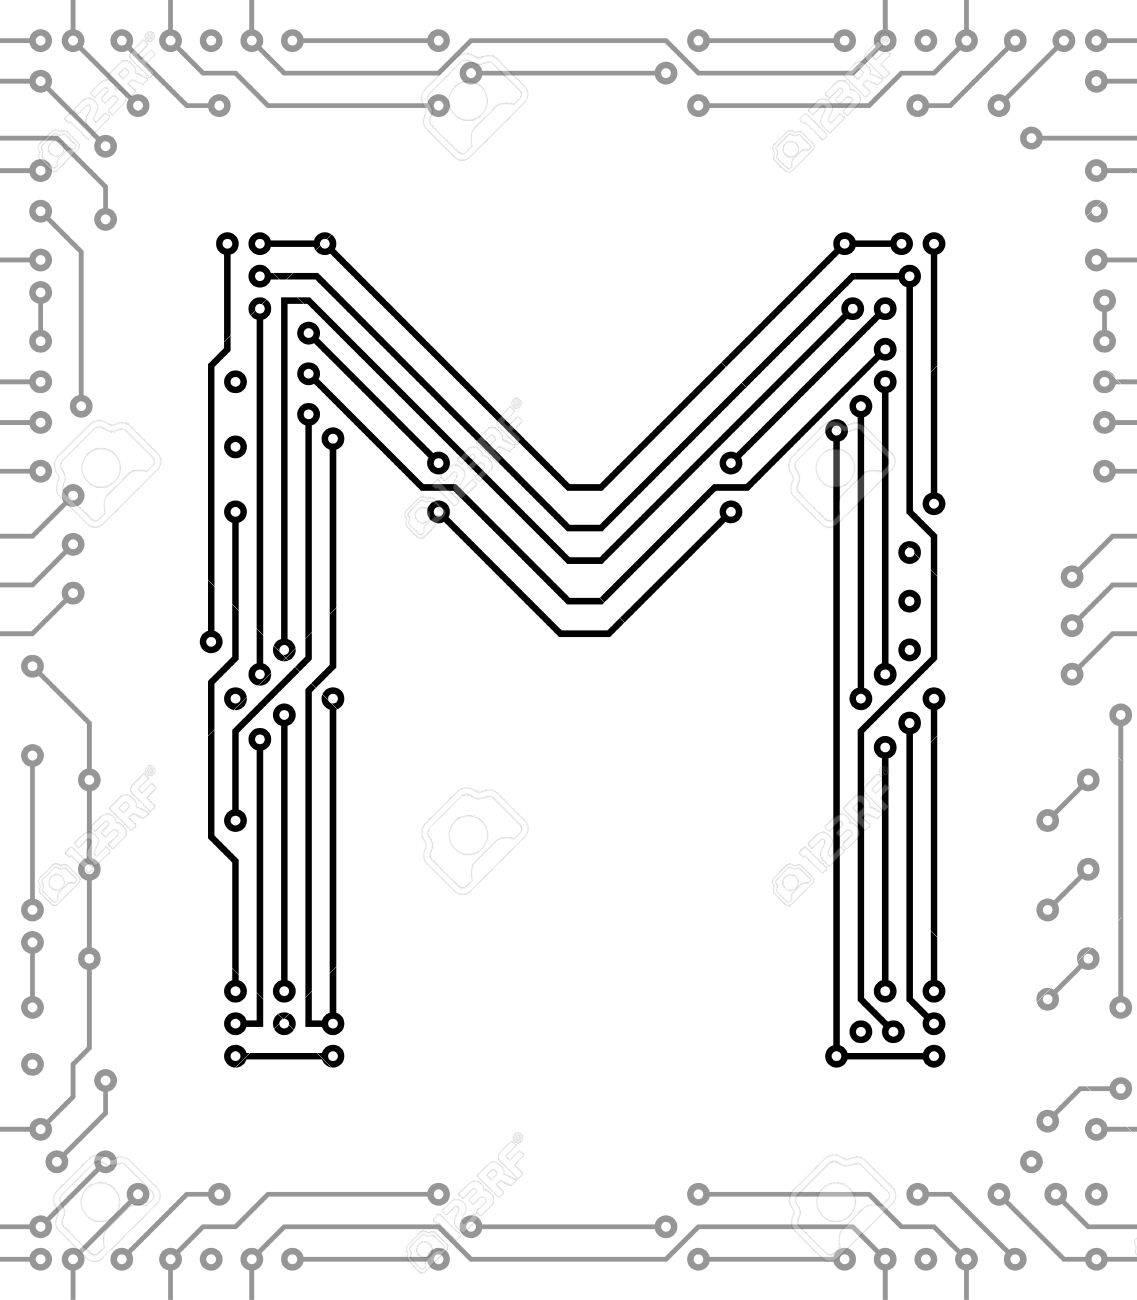 Best Digi Set Timer Wiring Diagram Ideas - Electrical System Block ...